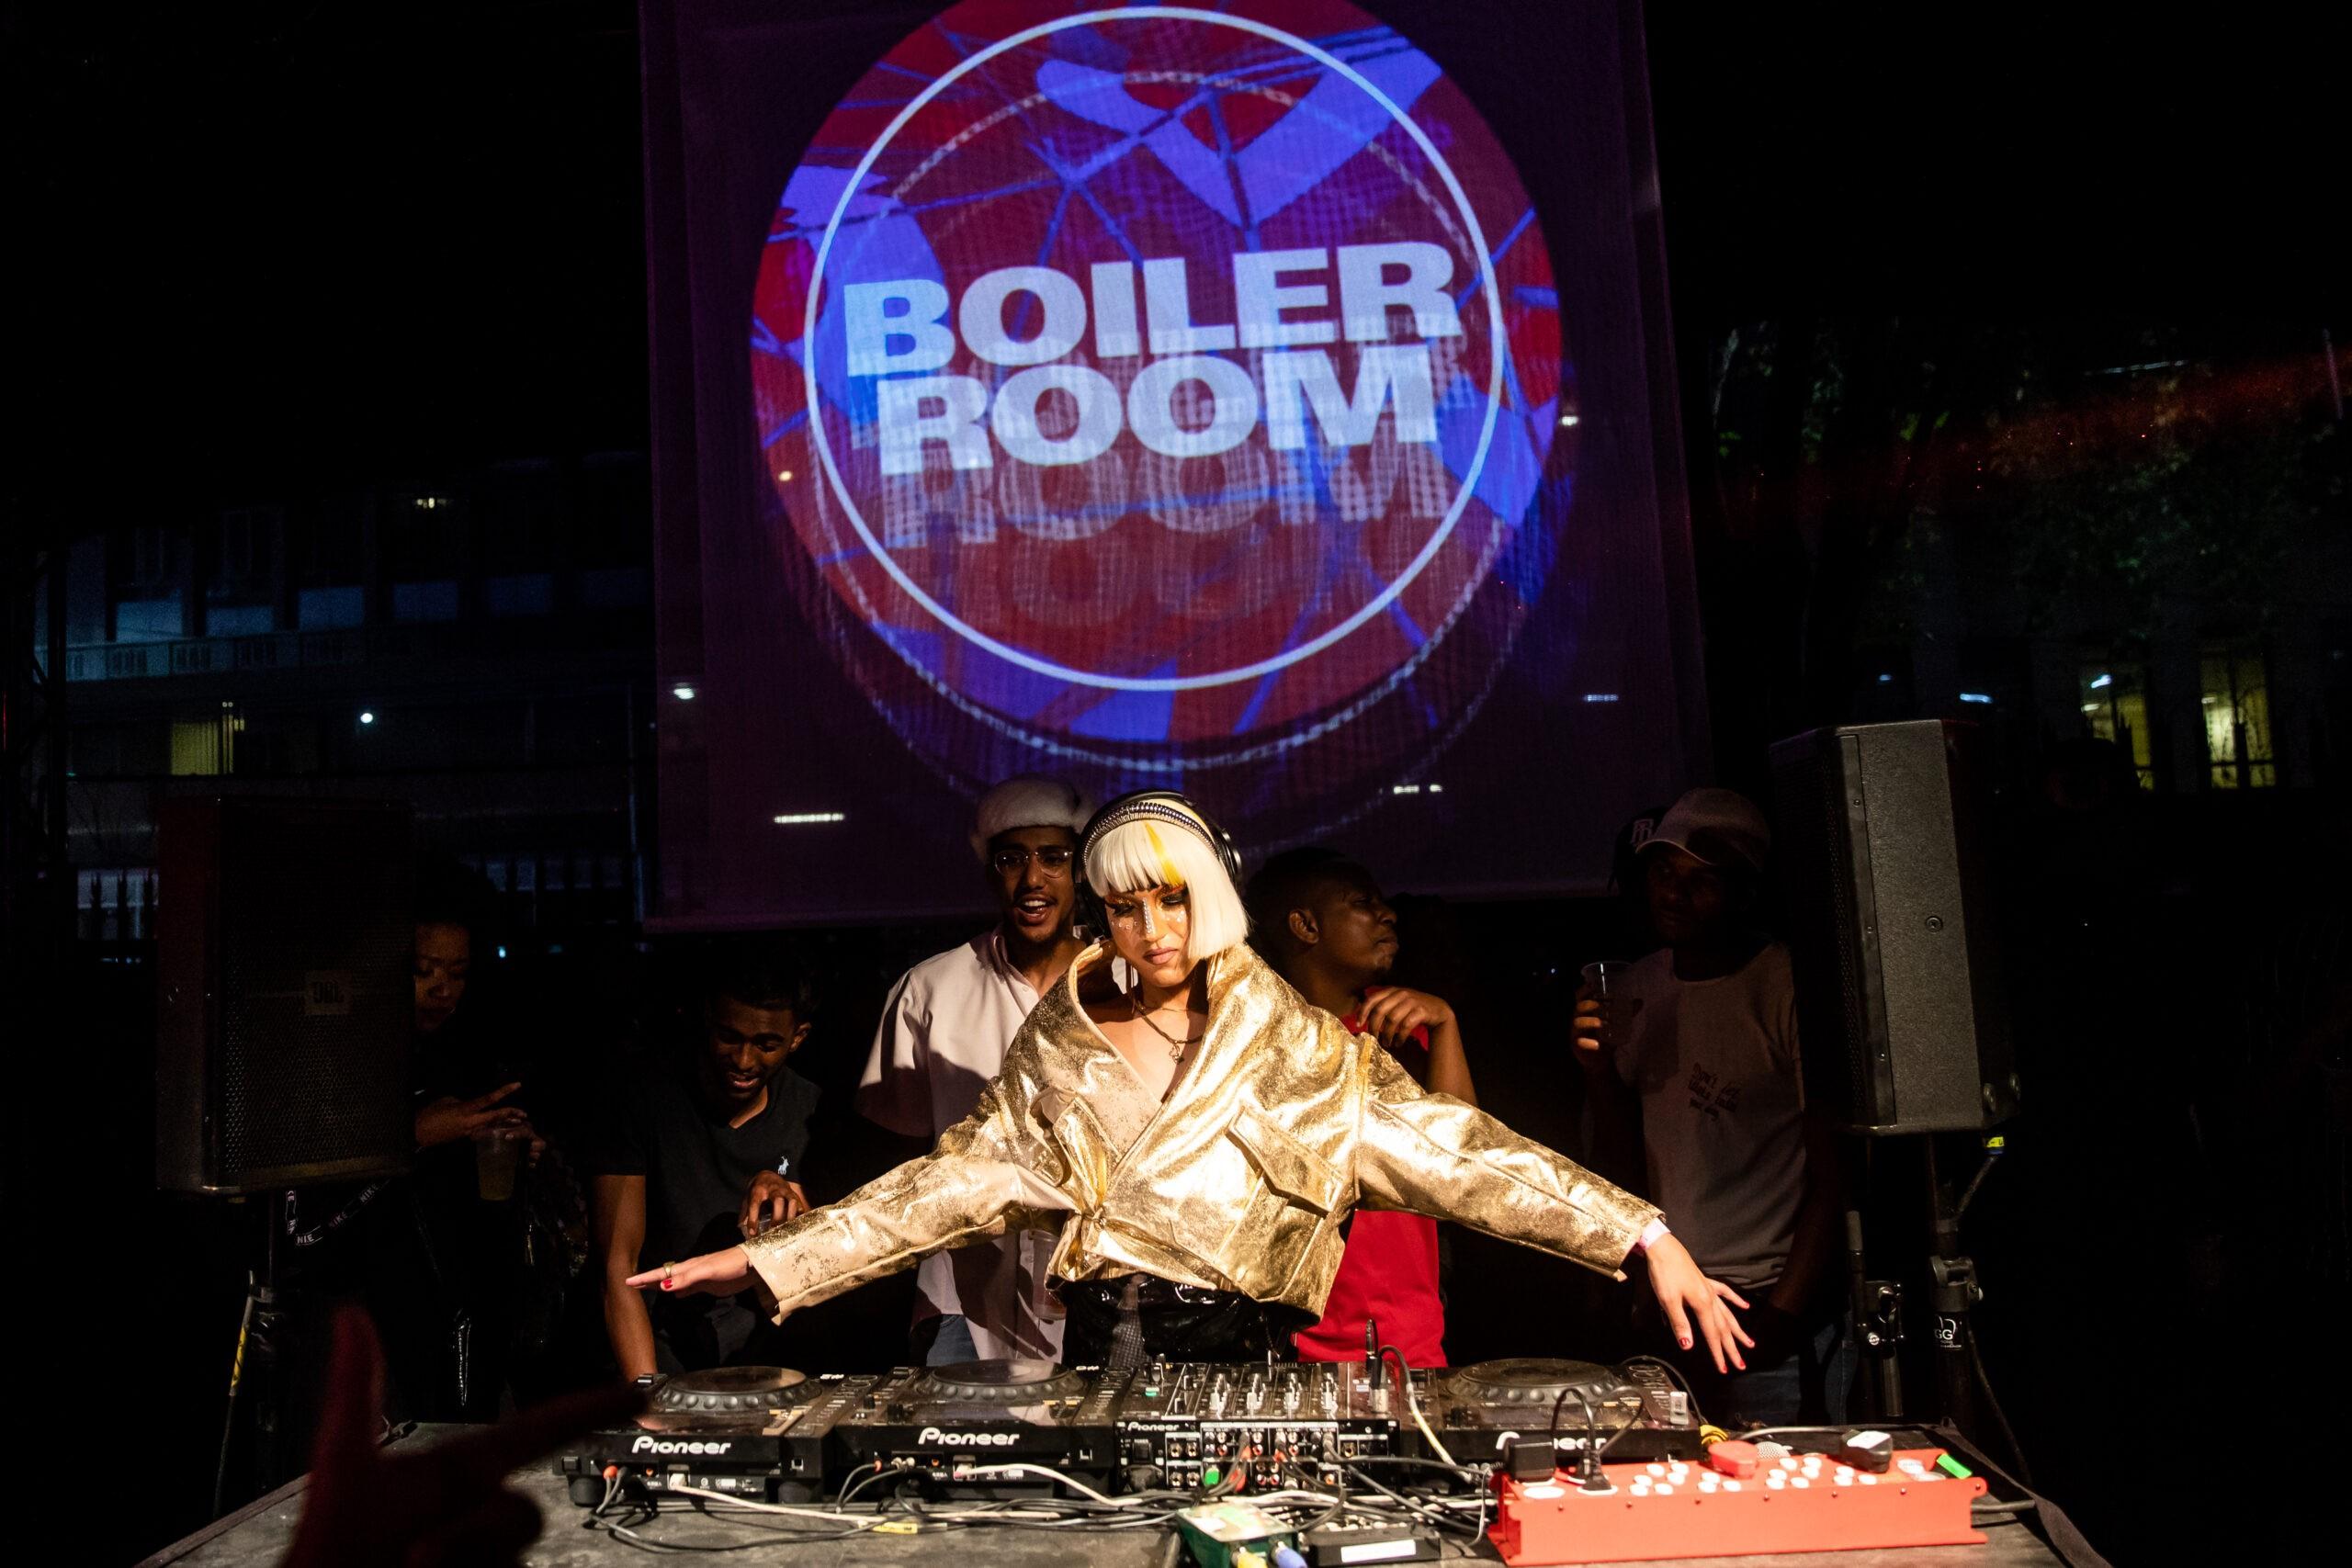 Ballantines Boiler Room DJ Queezy